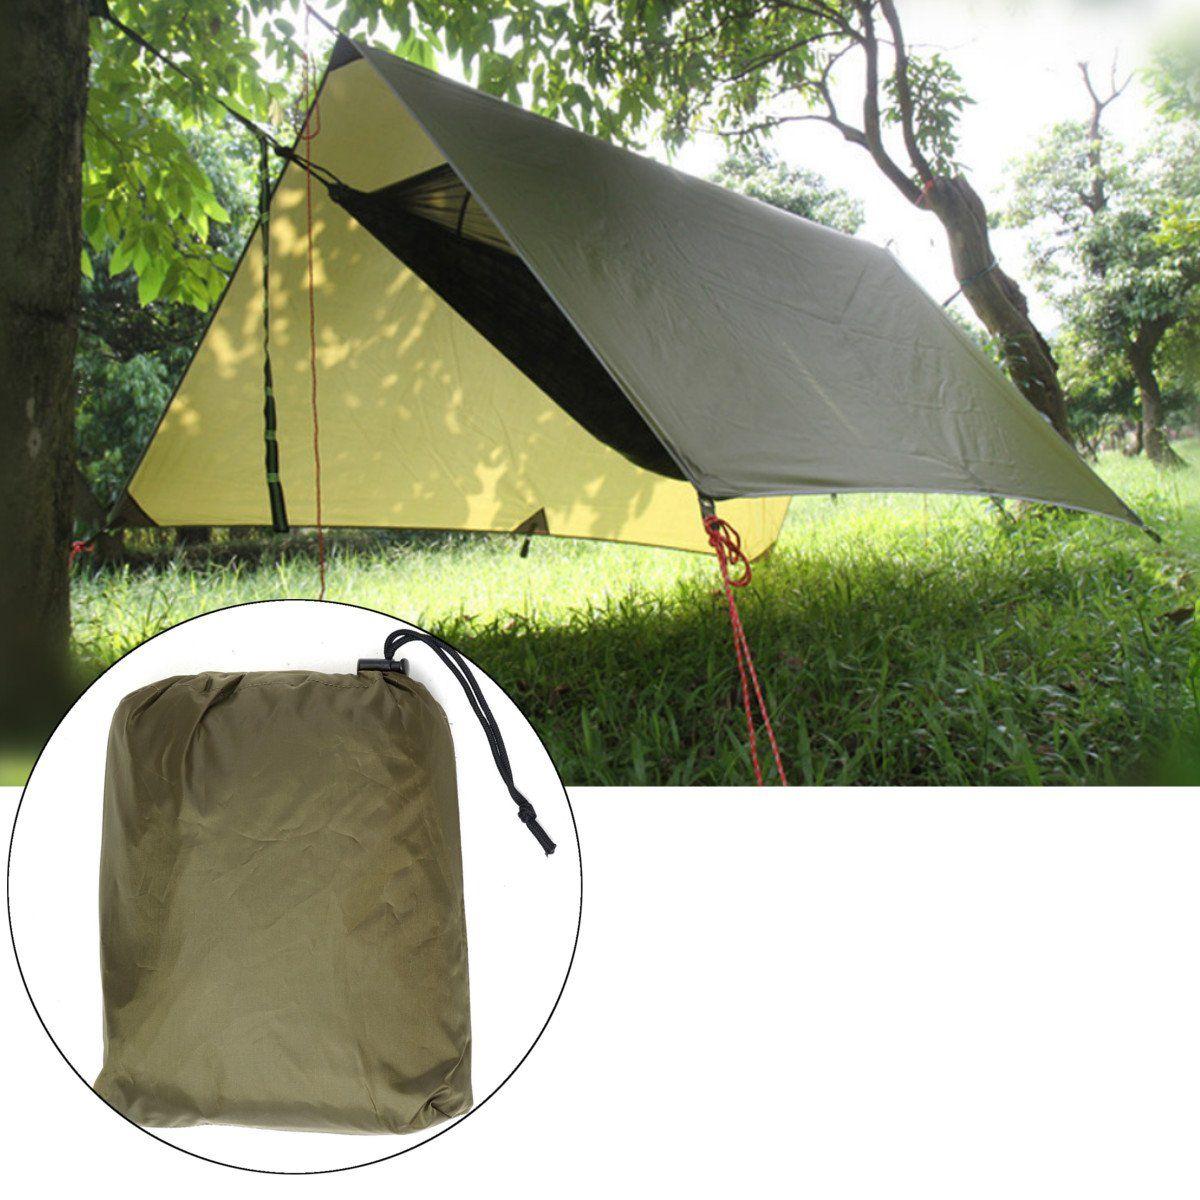 Outdoor Camping Tent Sunshade Canopy Waterproof Anti UV